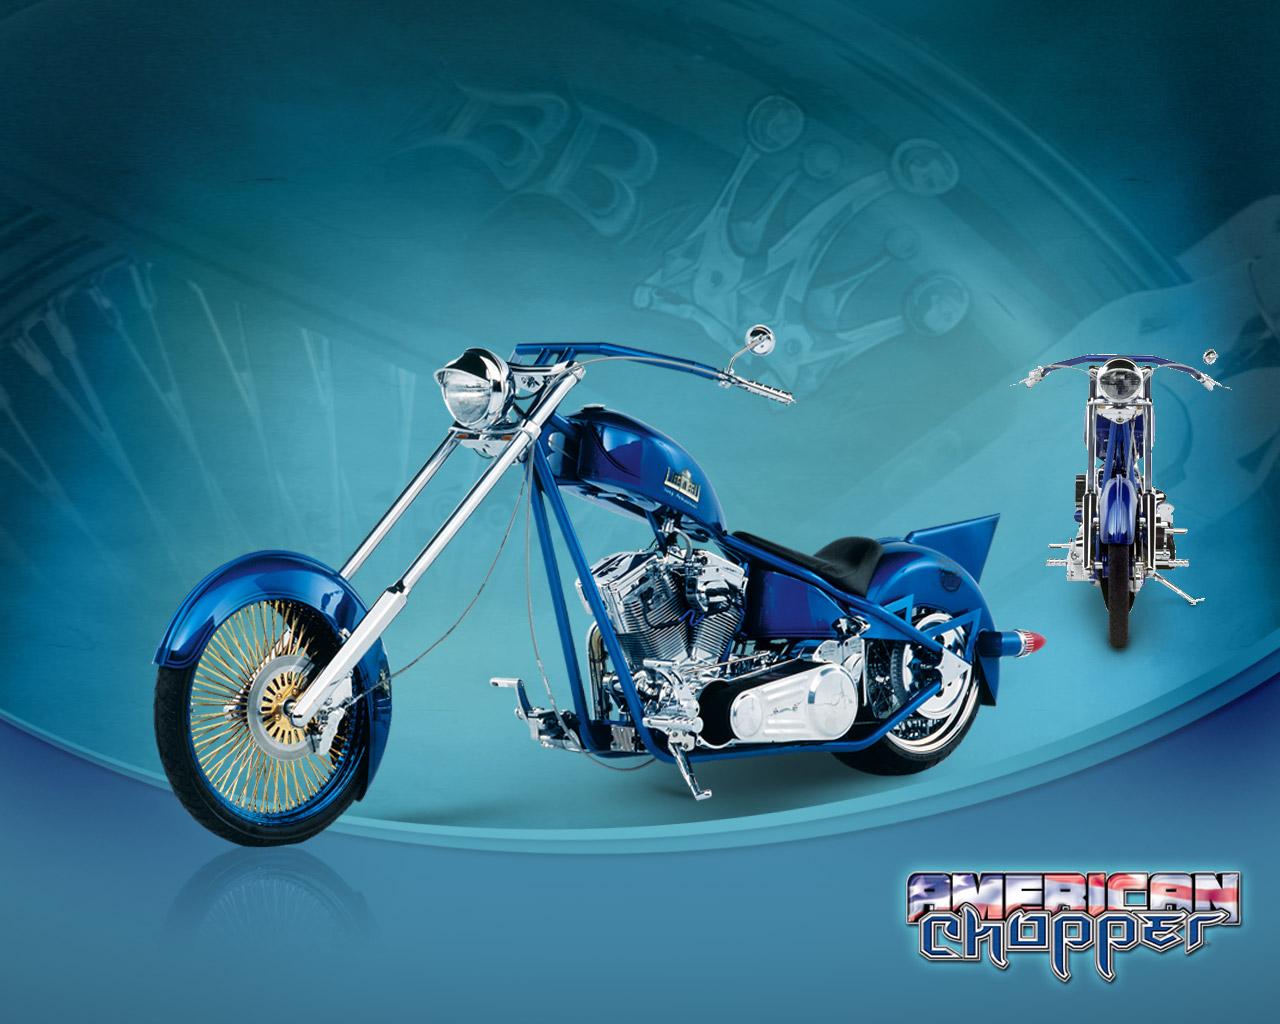 Imagini Desktop  Motociclete Americane   American Chopper